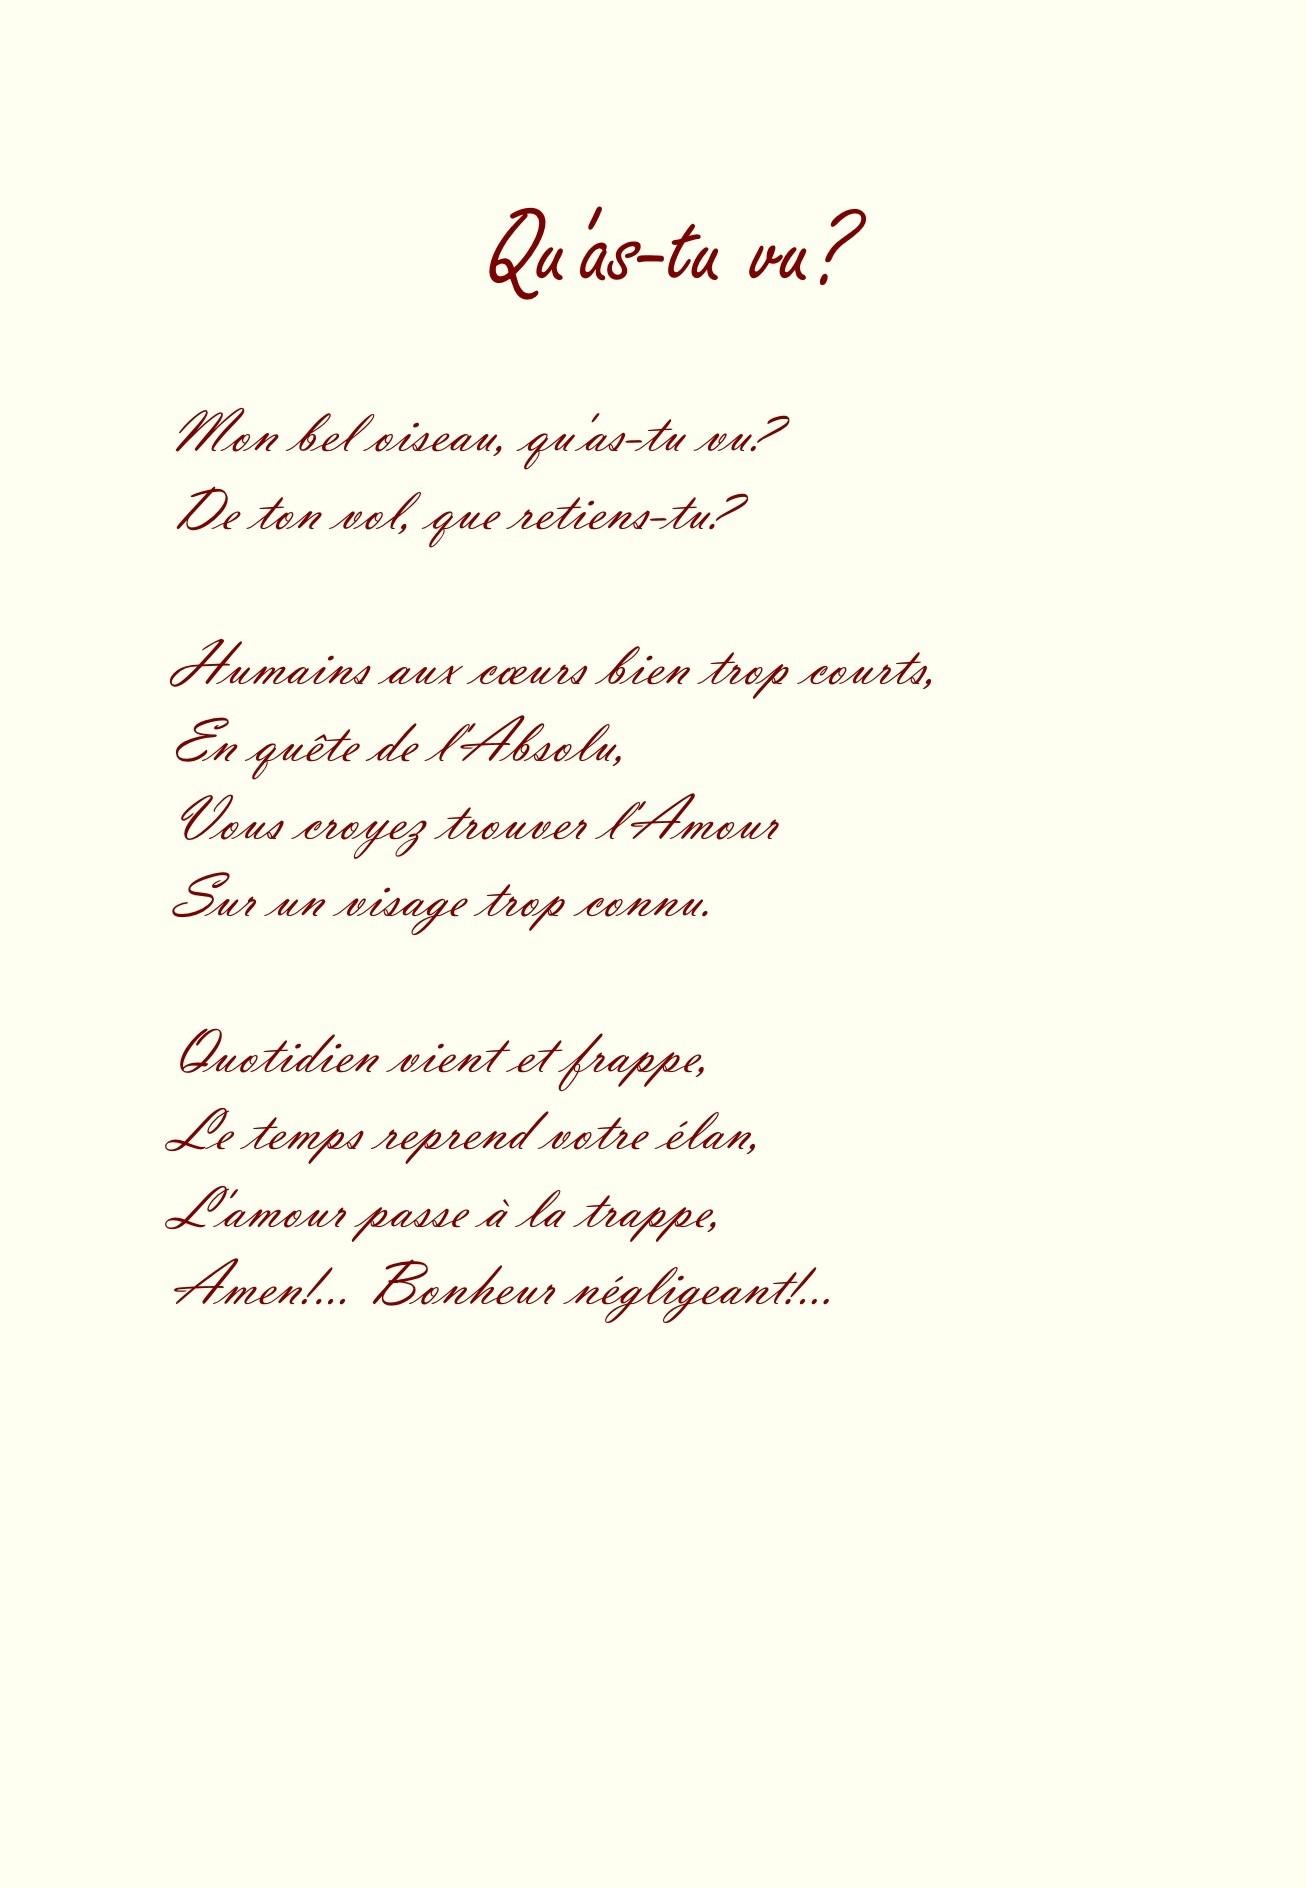 Recueil du rossignol poeme et sanguine de jean joseph chevalier 39